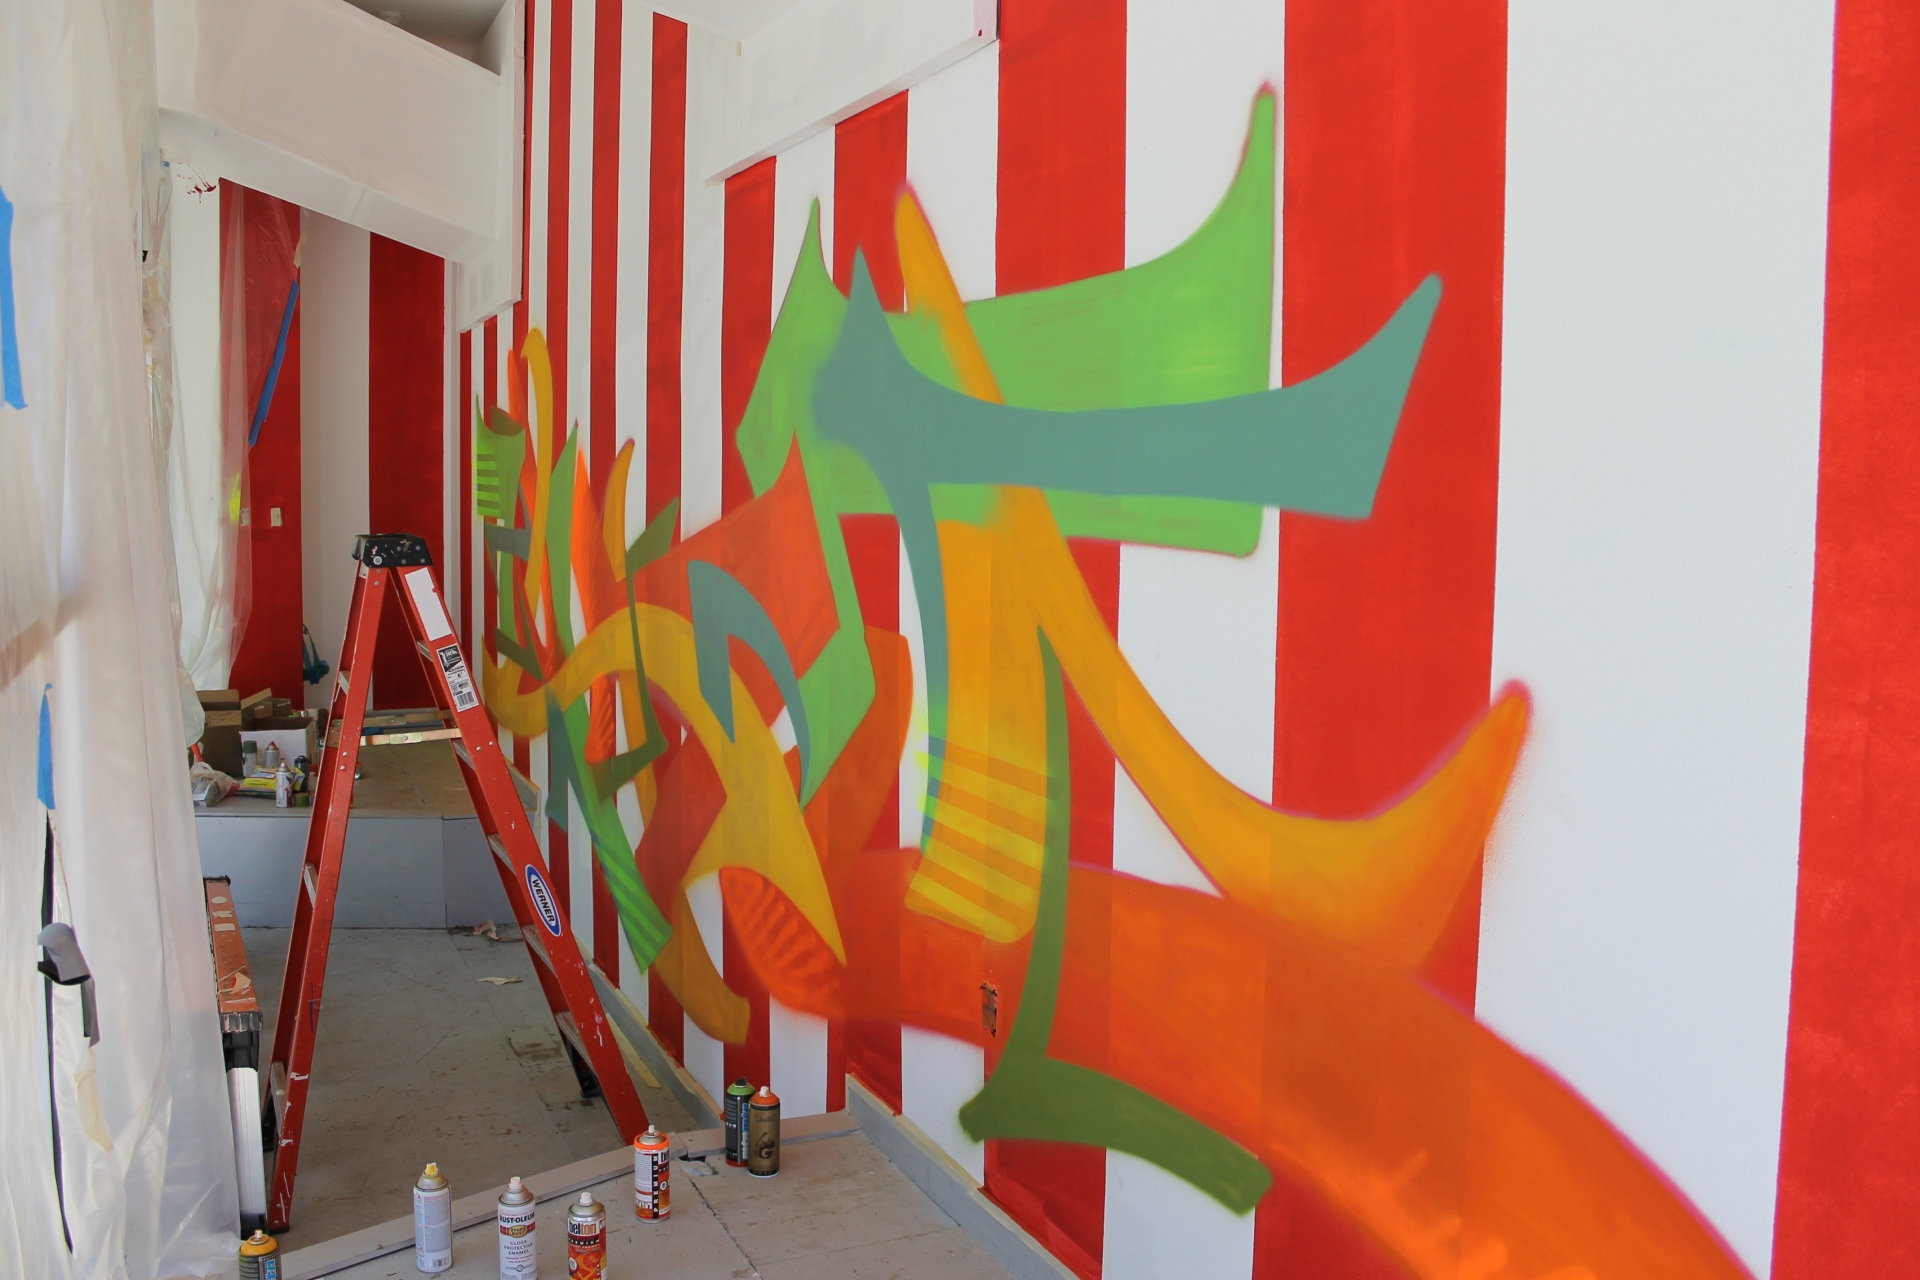 Kenji Stoll Artscape 2012